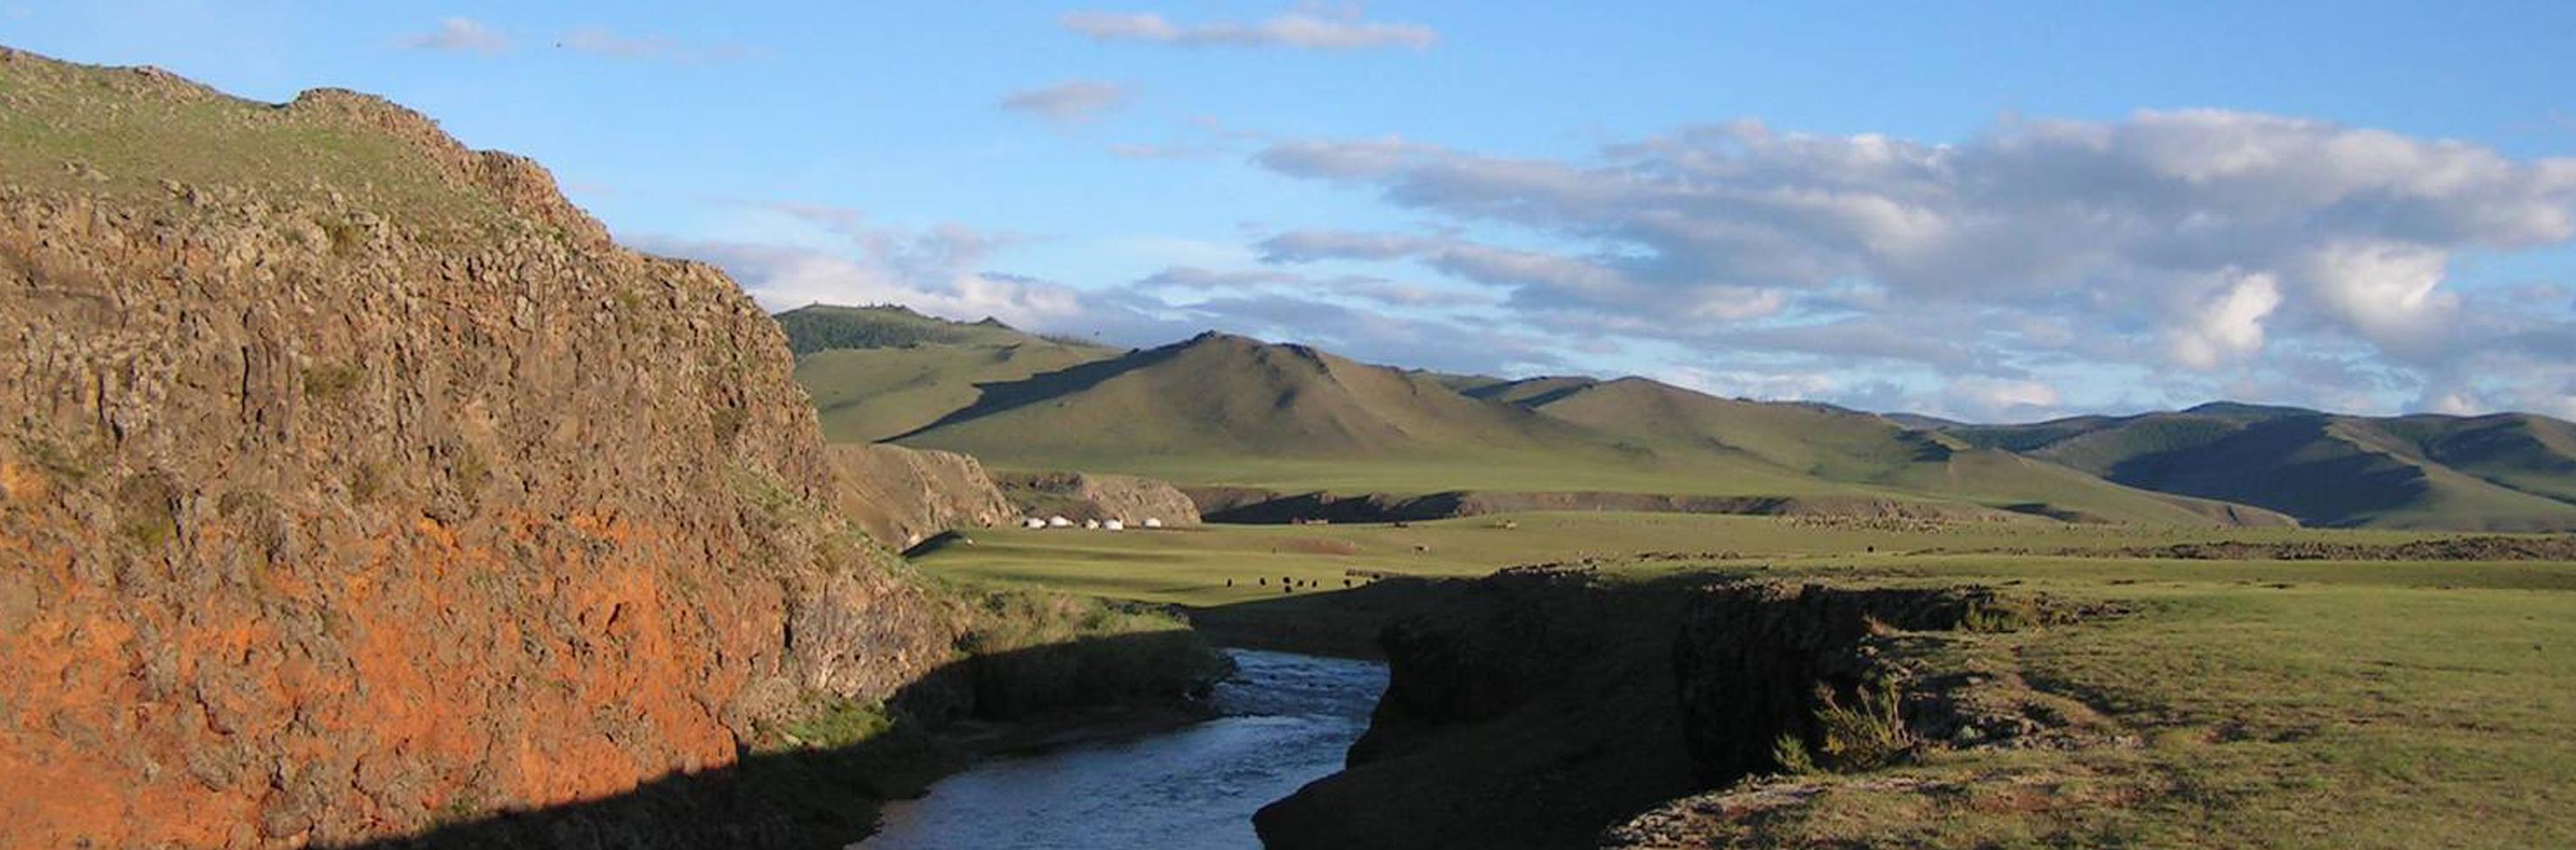 Mongolei ein abenteuer for Ch homes